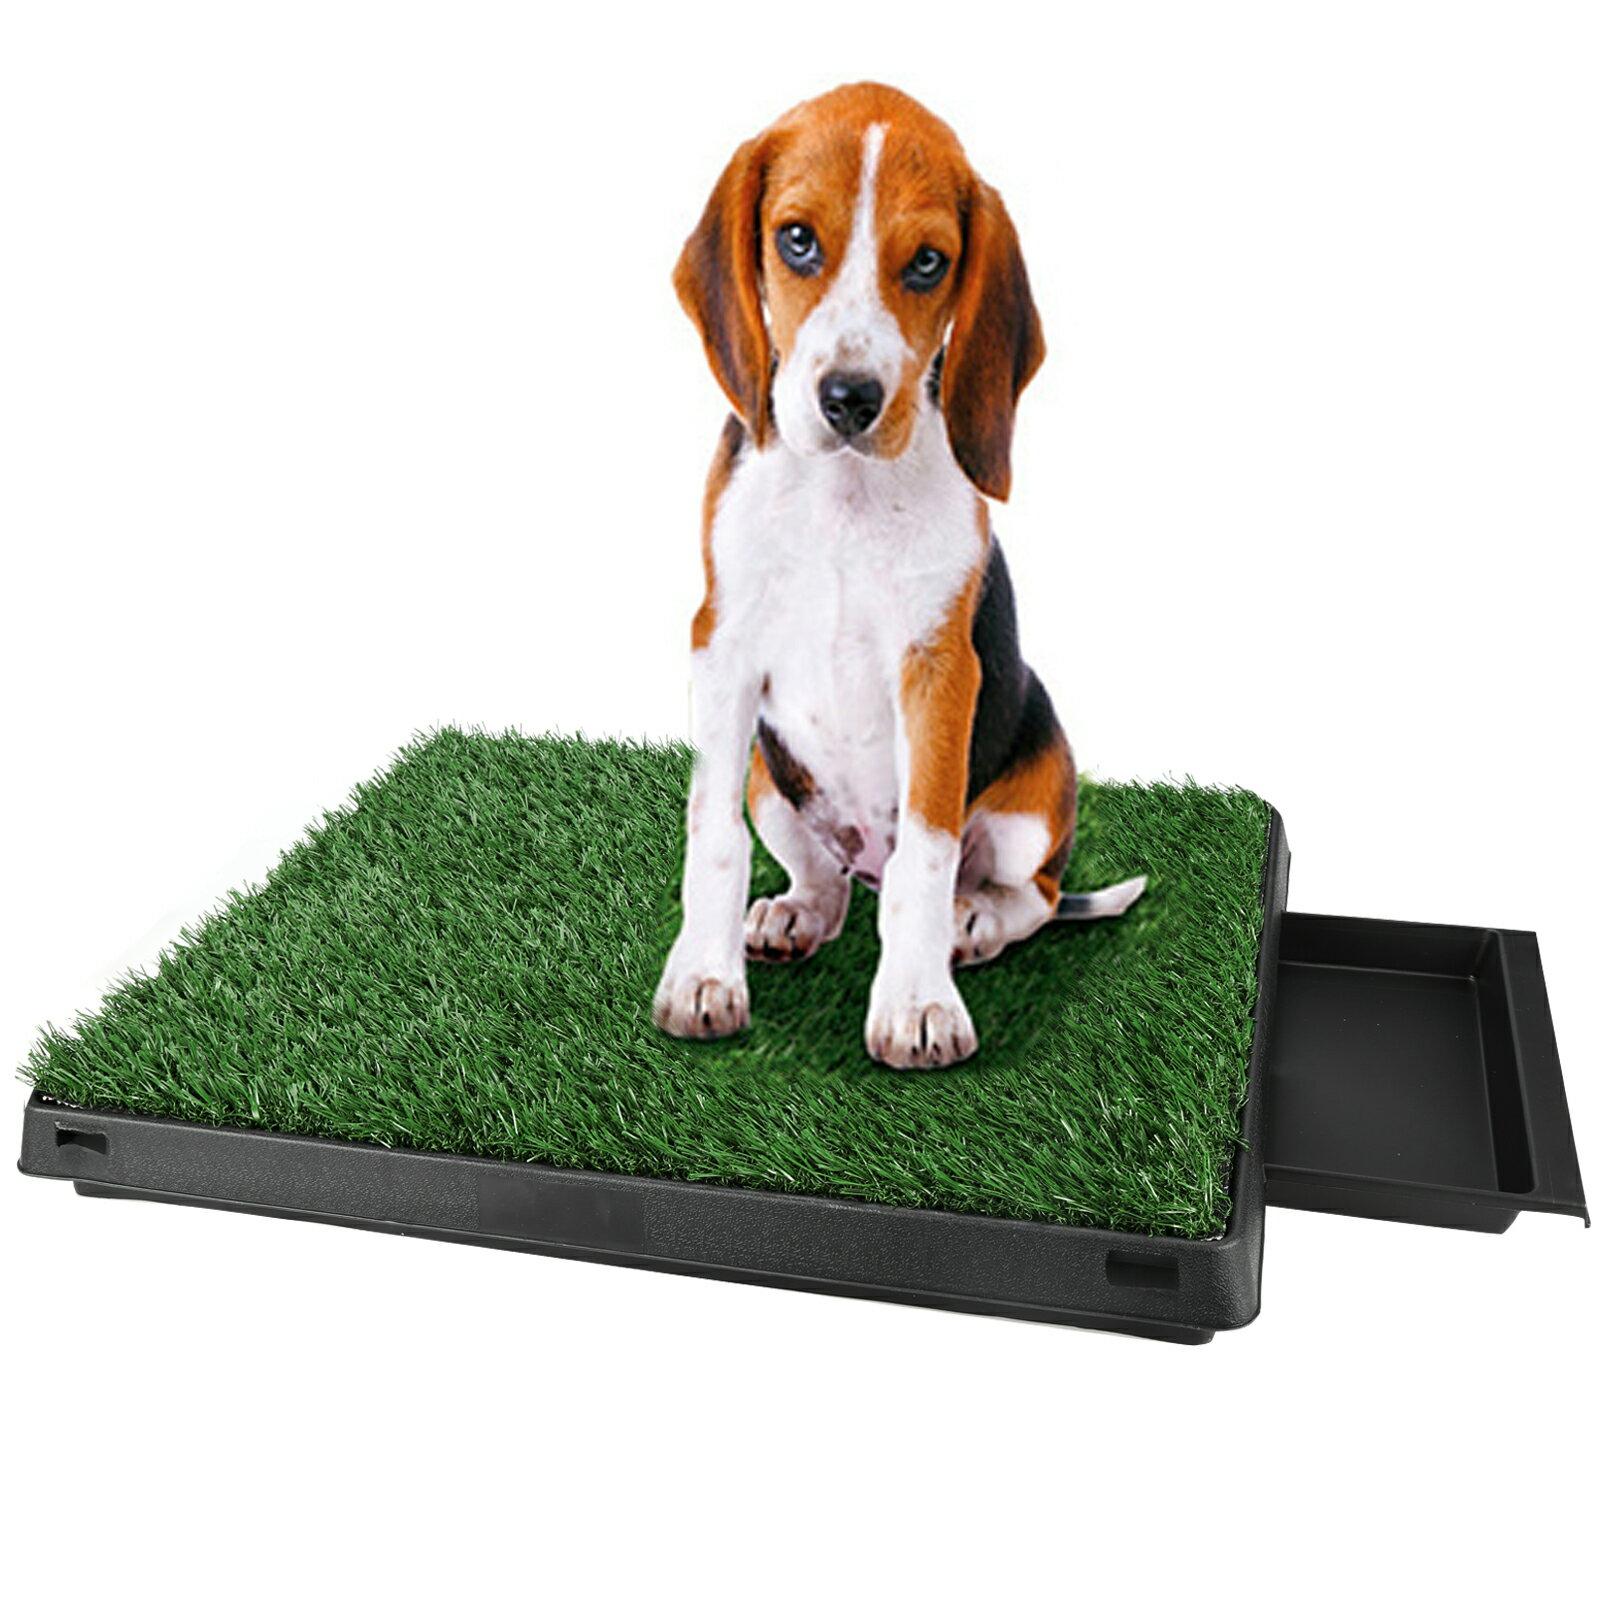 Pet Park Indoor Potty Dog Grass Mat Training Pad Pet Potty 0